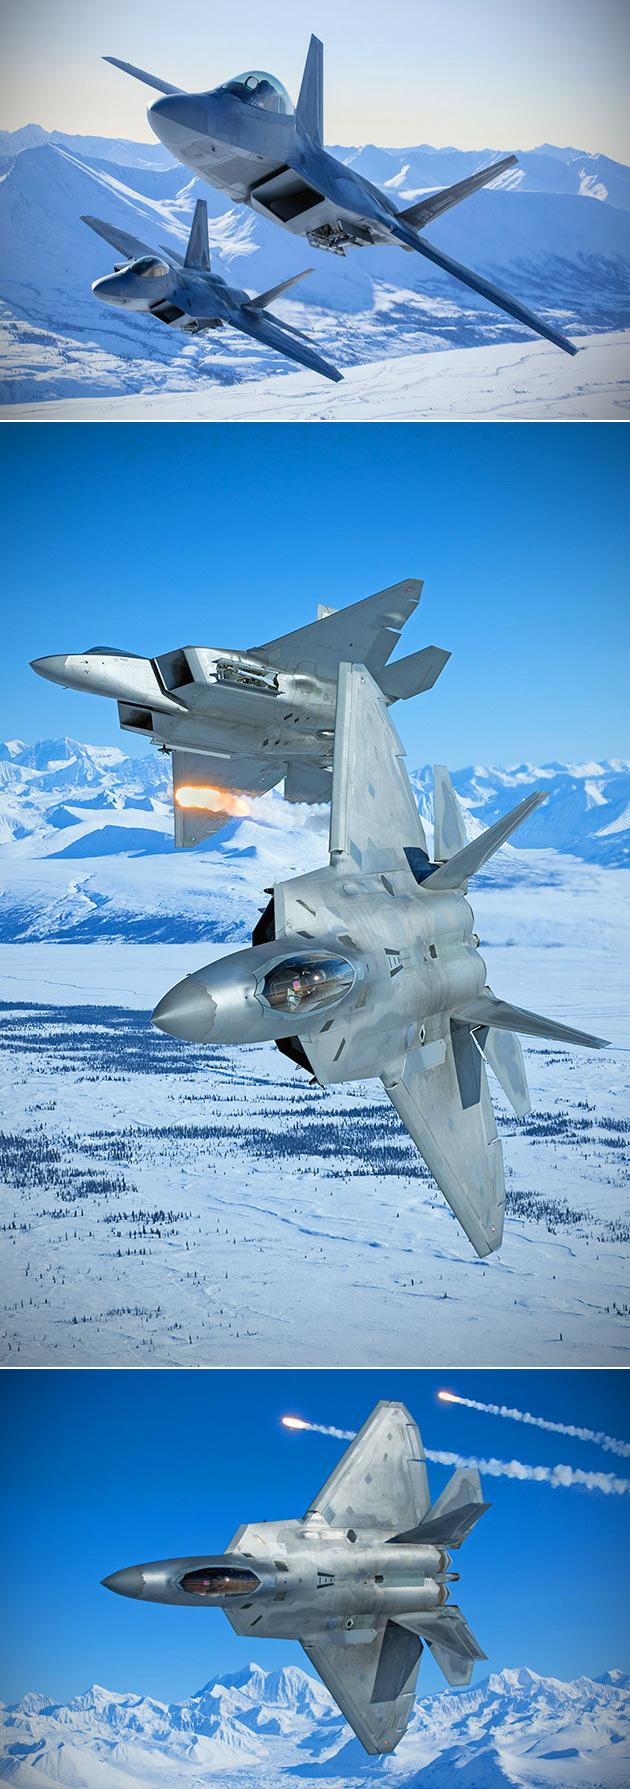 F-22 Raptor Arctic